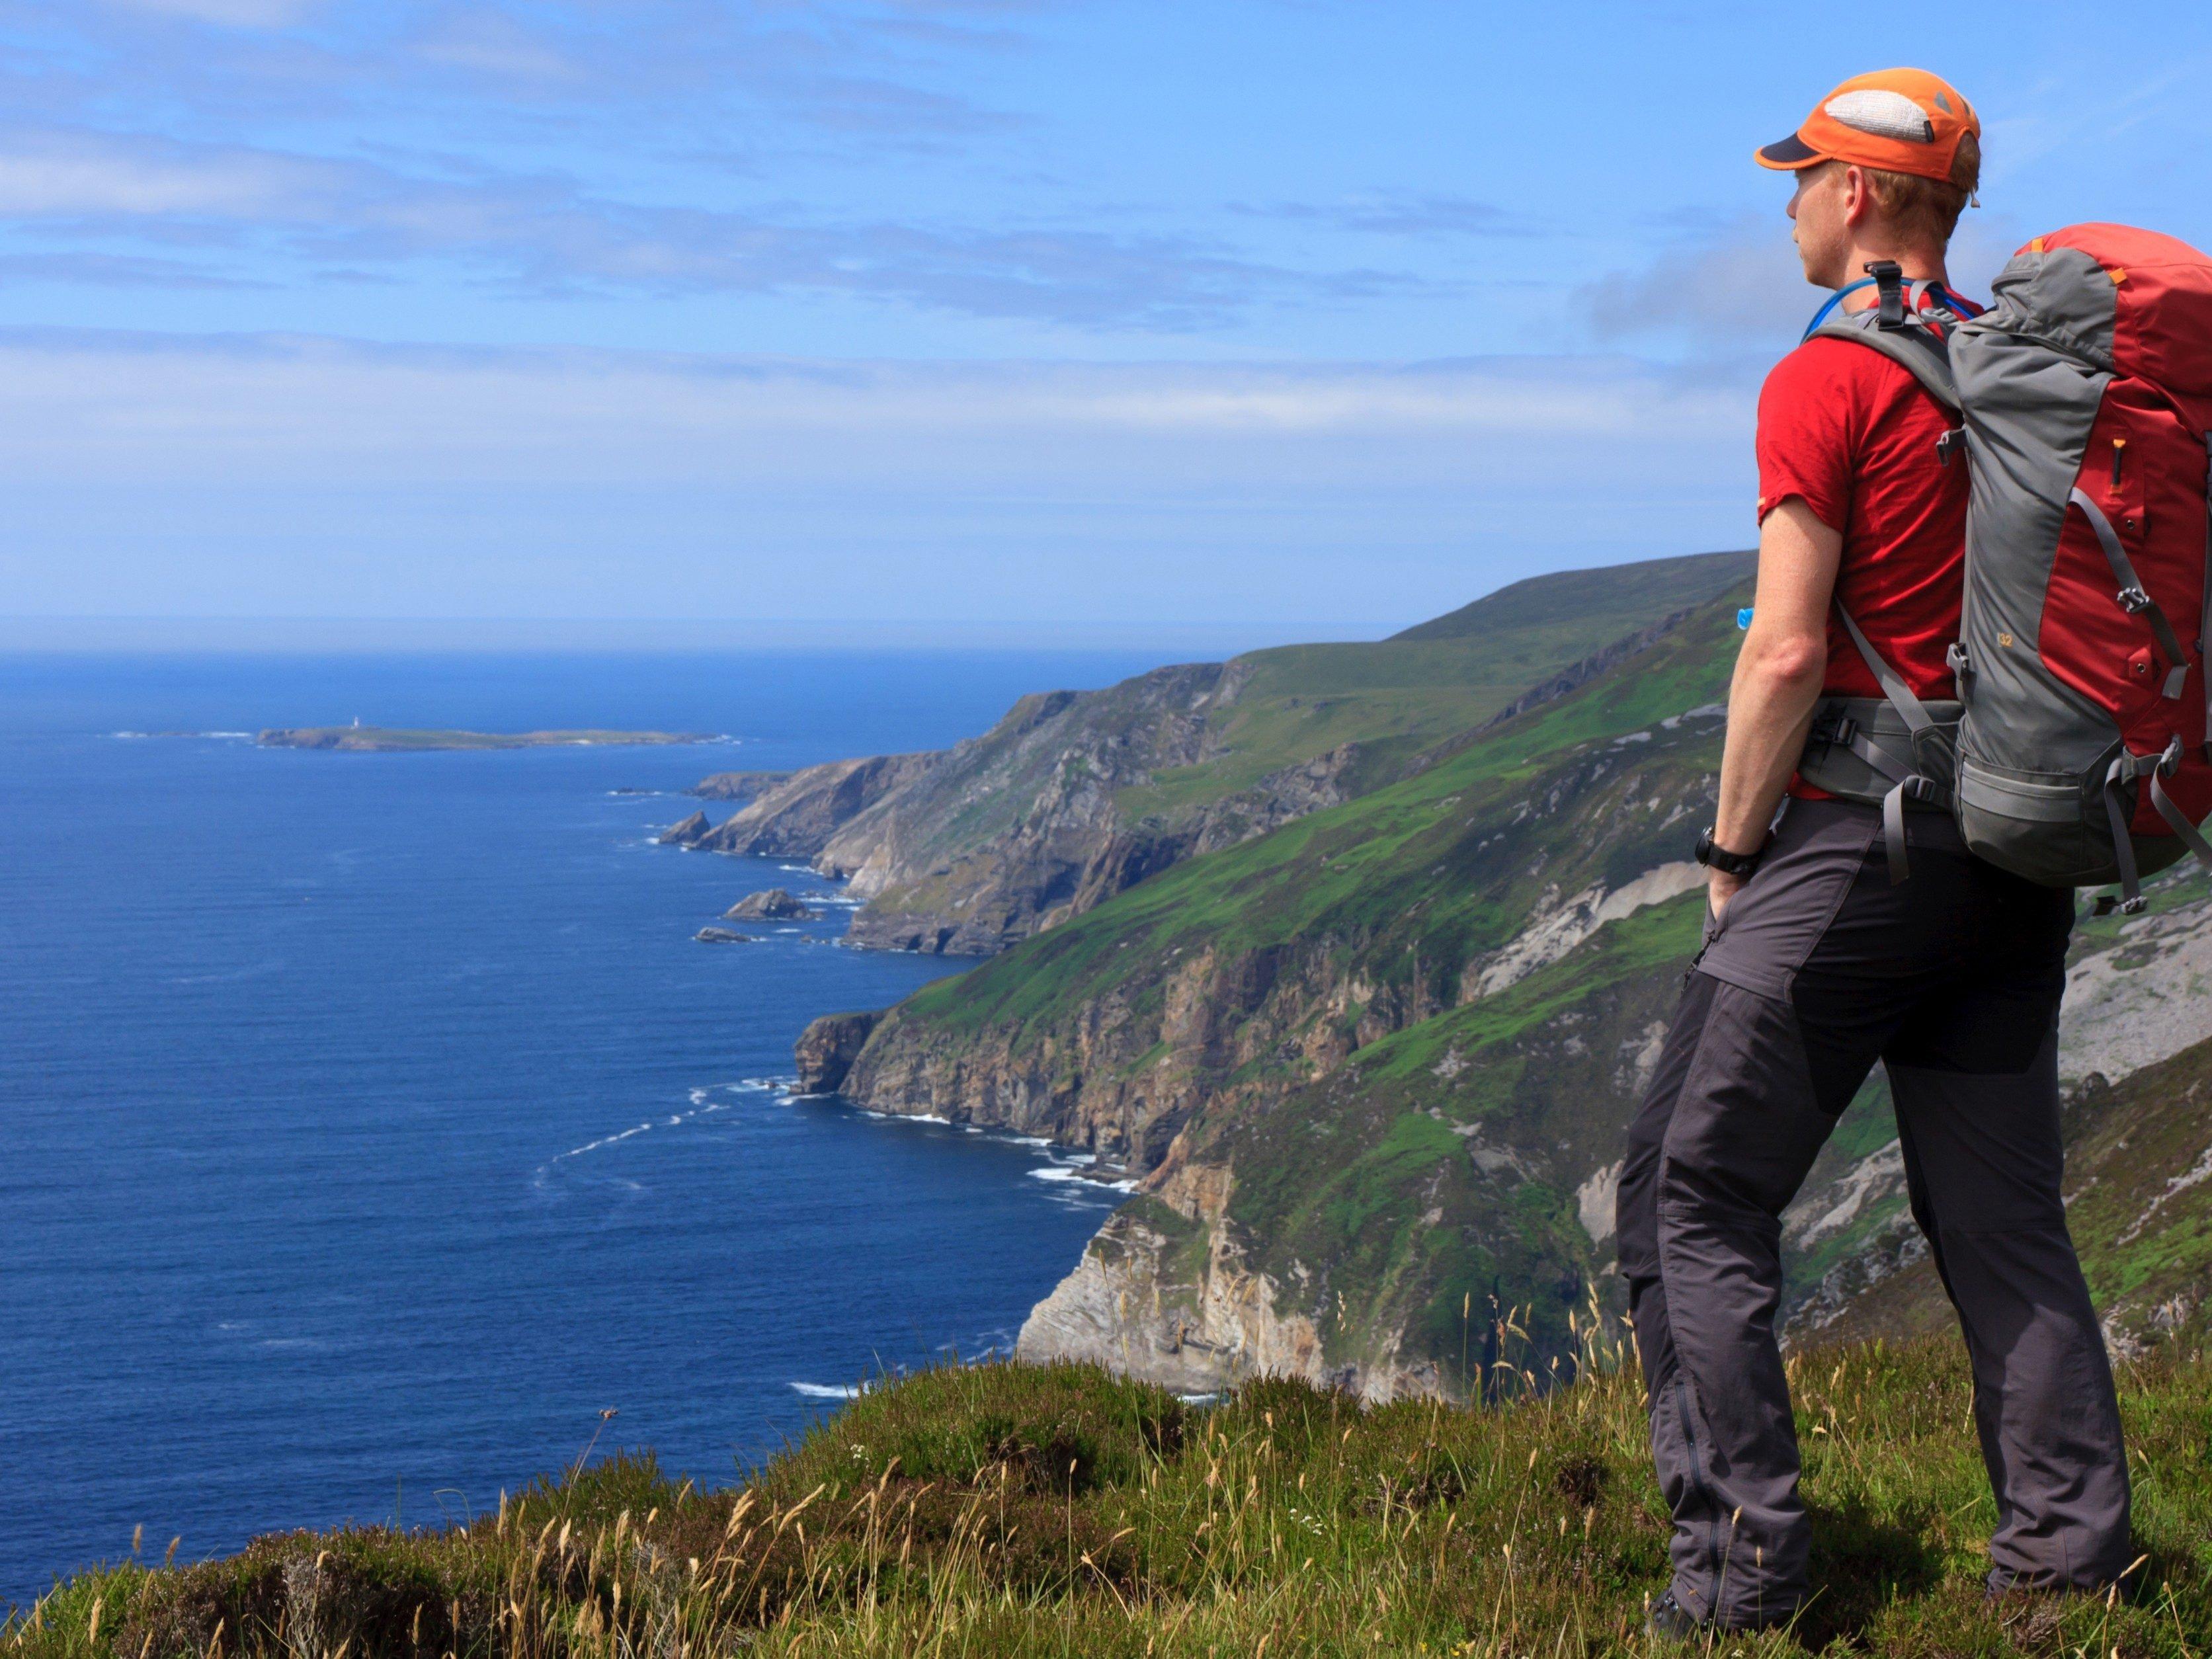 3. Have an Irish Adventure